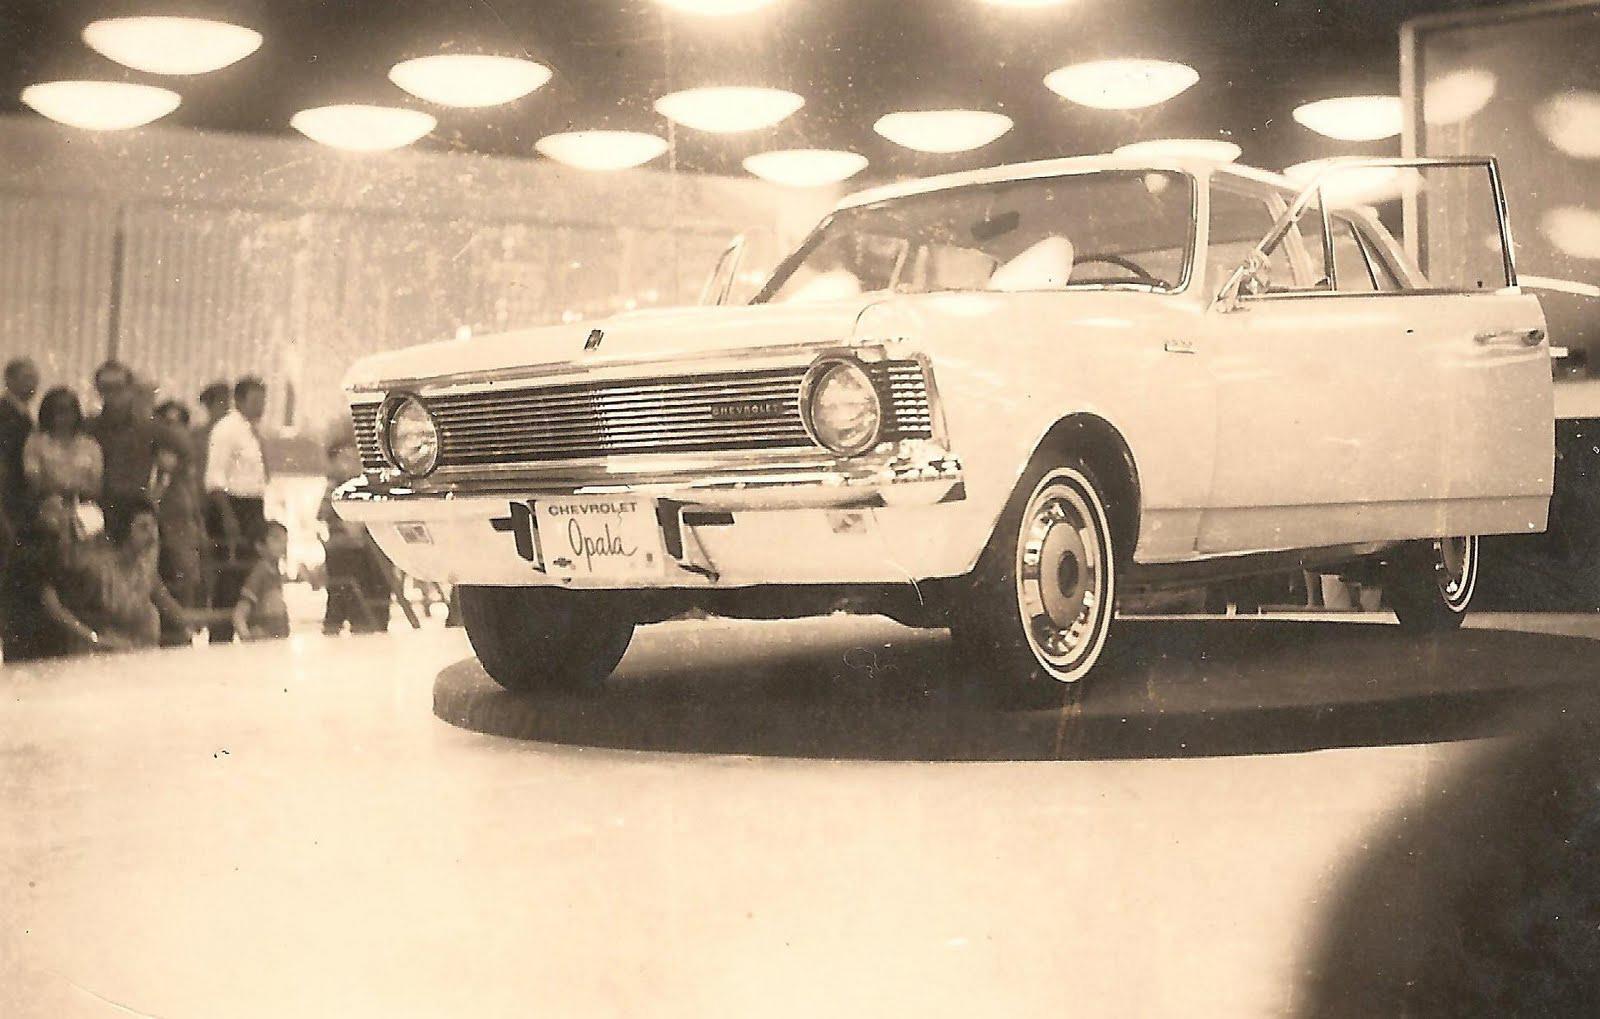 chevrolet opala durante lancamento no salao do automovel 1968 credito para ingo hoffman arquivo pessoal